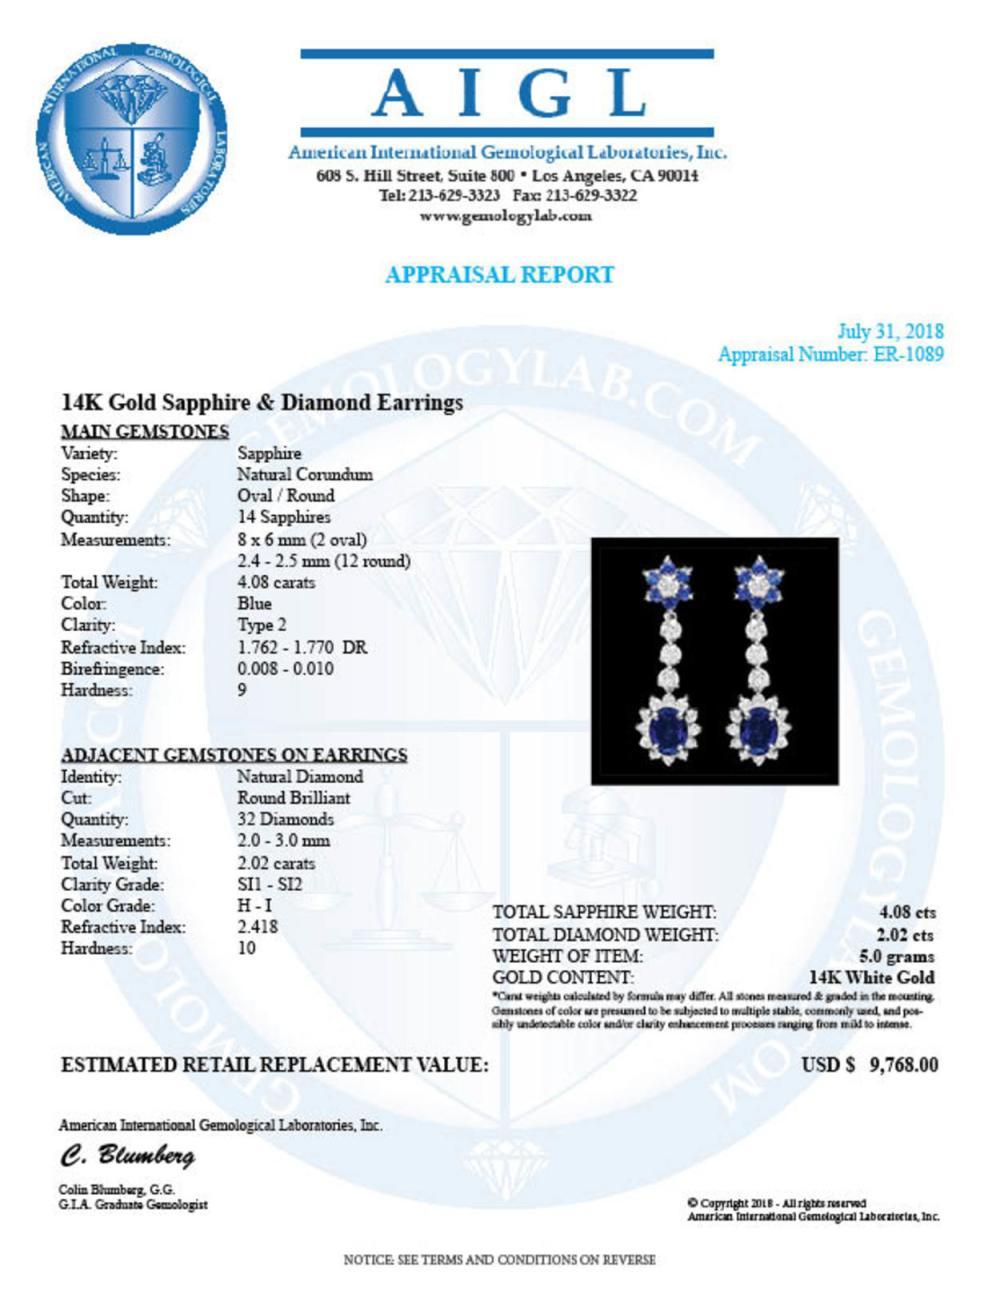 Lot 176: 14K Gold 4.08ct Sapphire 2.02ct Diamond Earrings